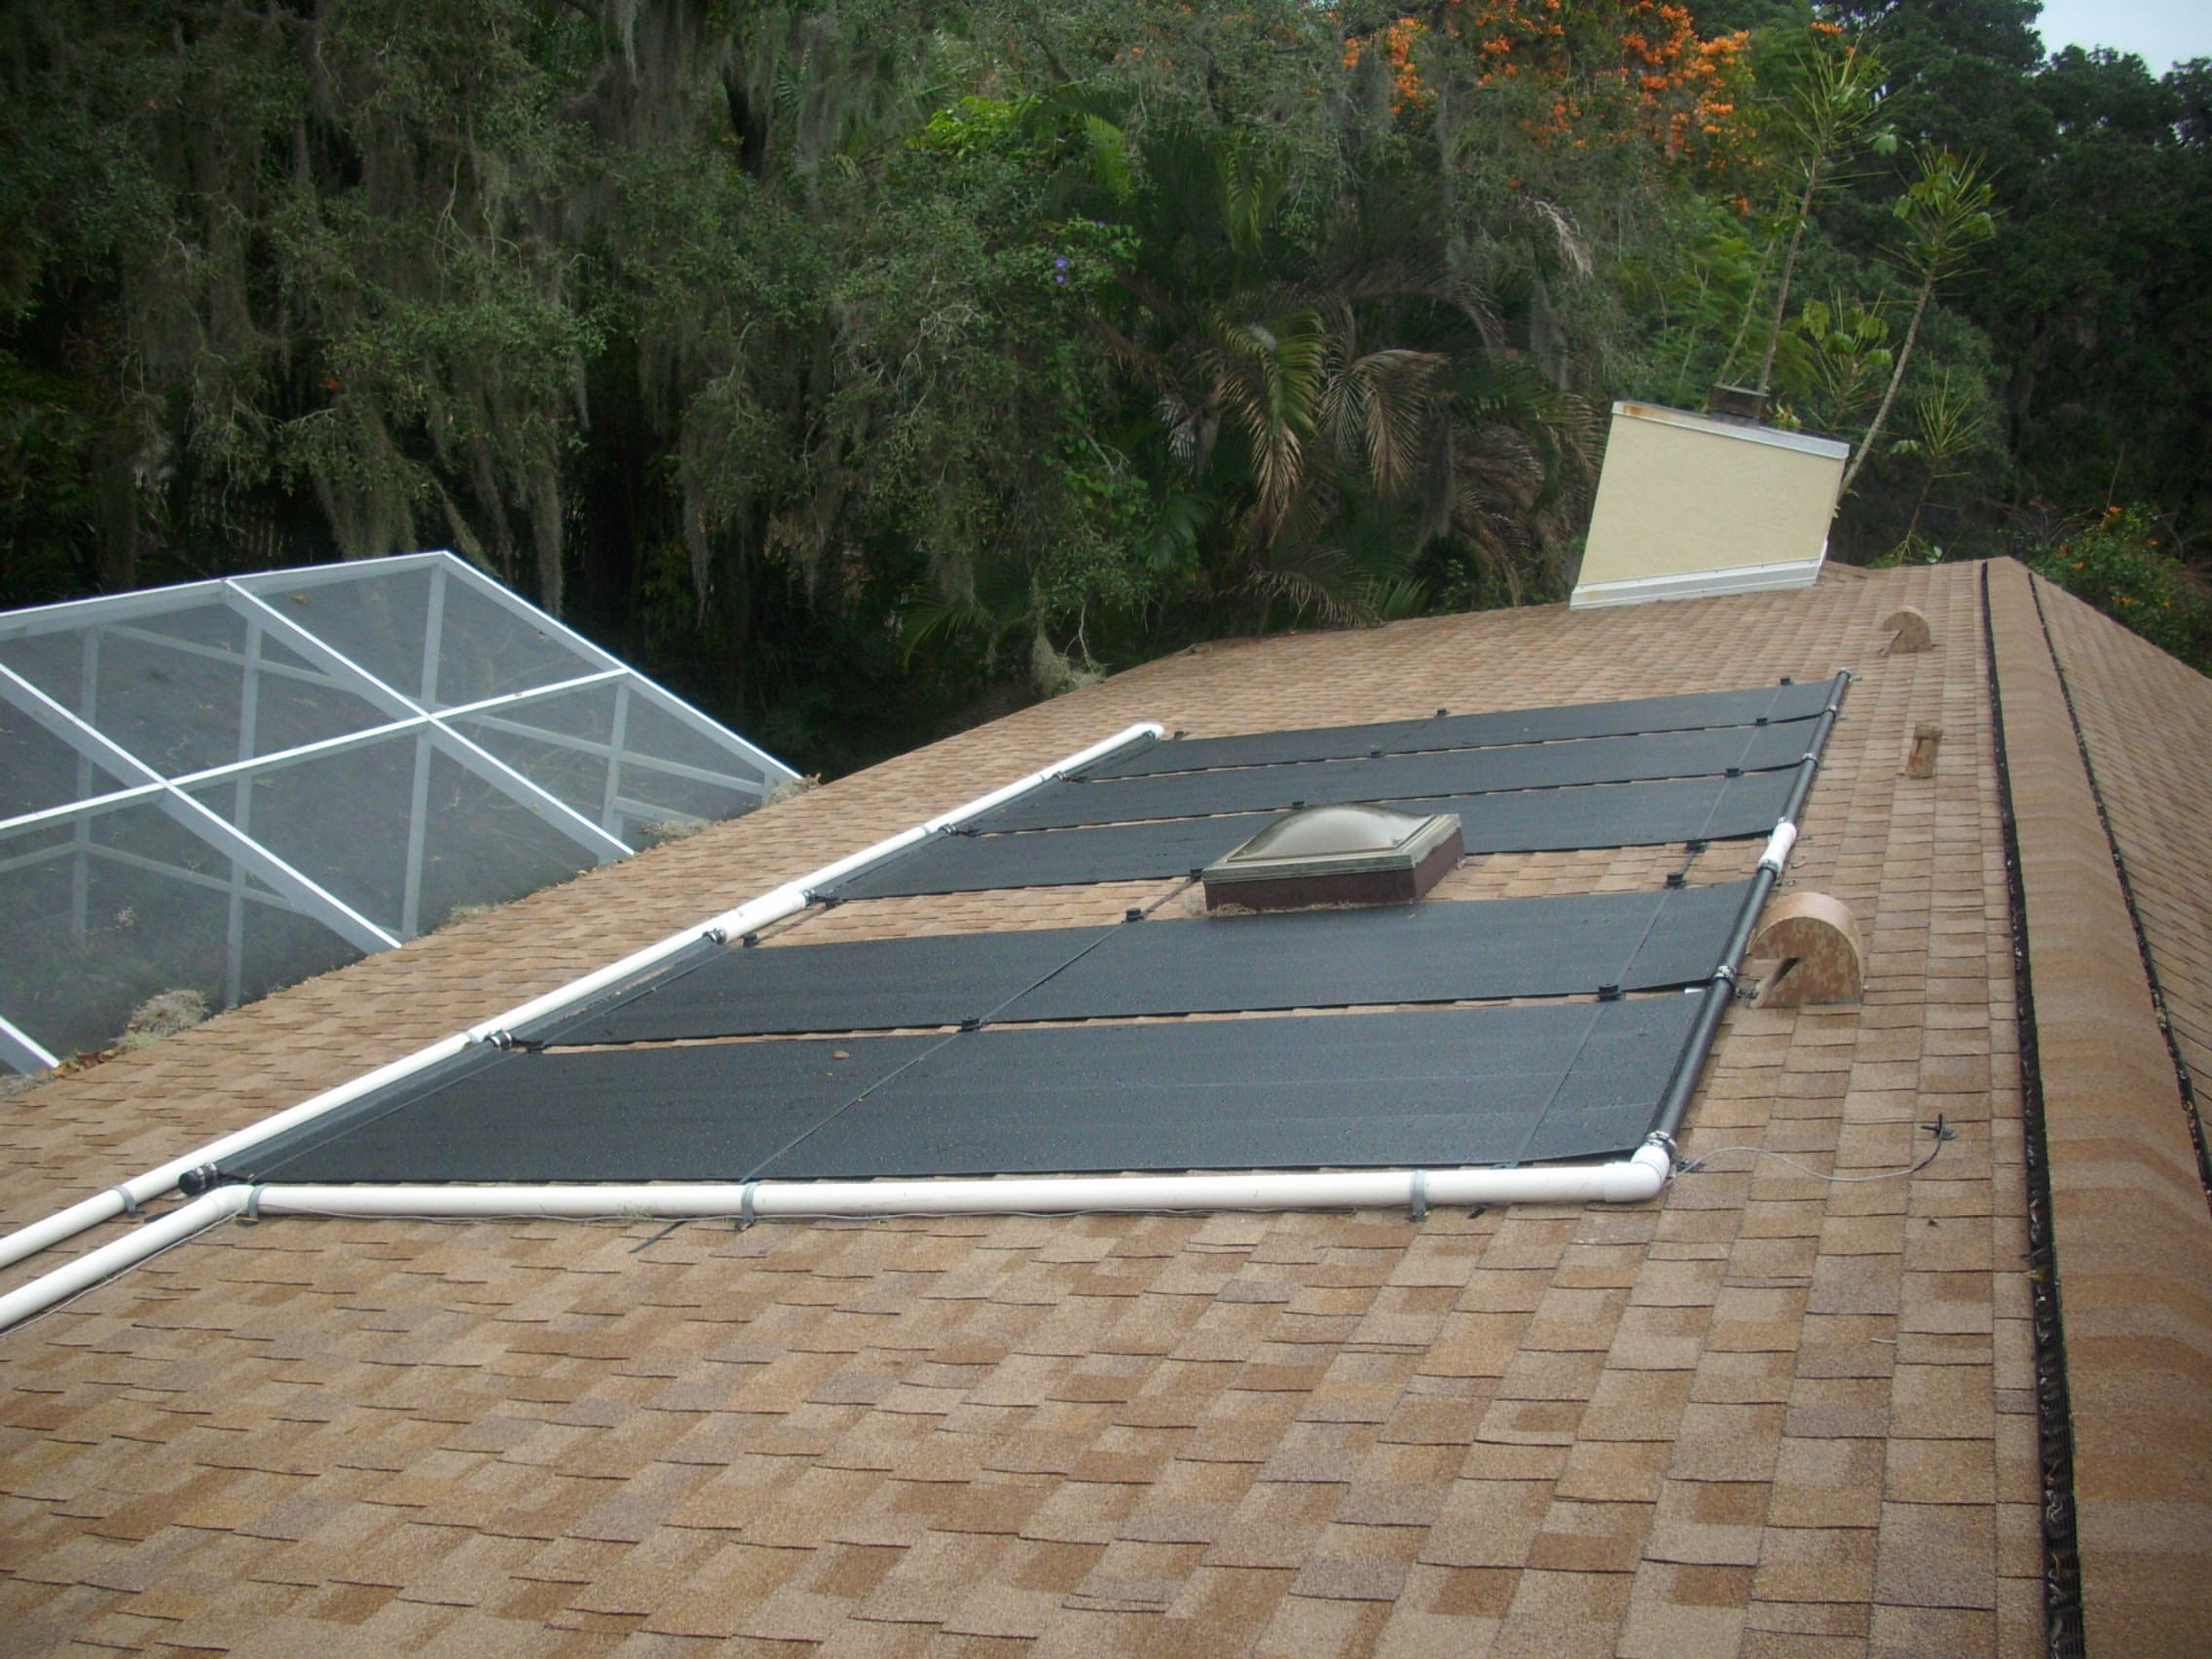 Vortex Solar Pool Heater Www Diysolarpoolheaterkits Com Solar Pool Heater Pool Heaters Solar Pool Heaters